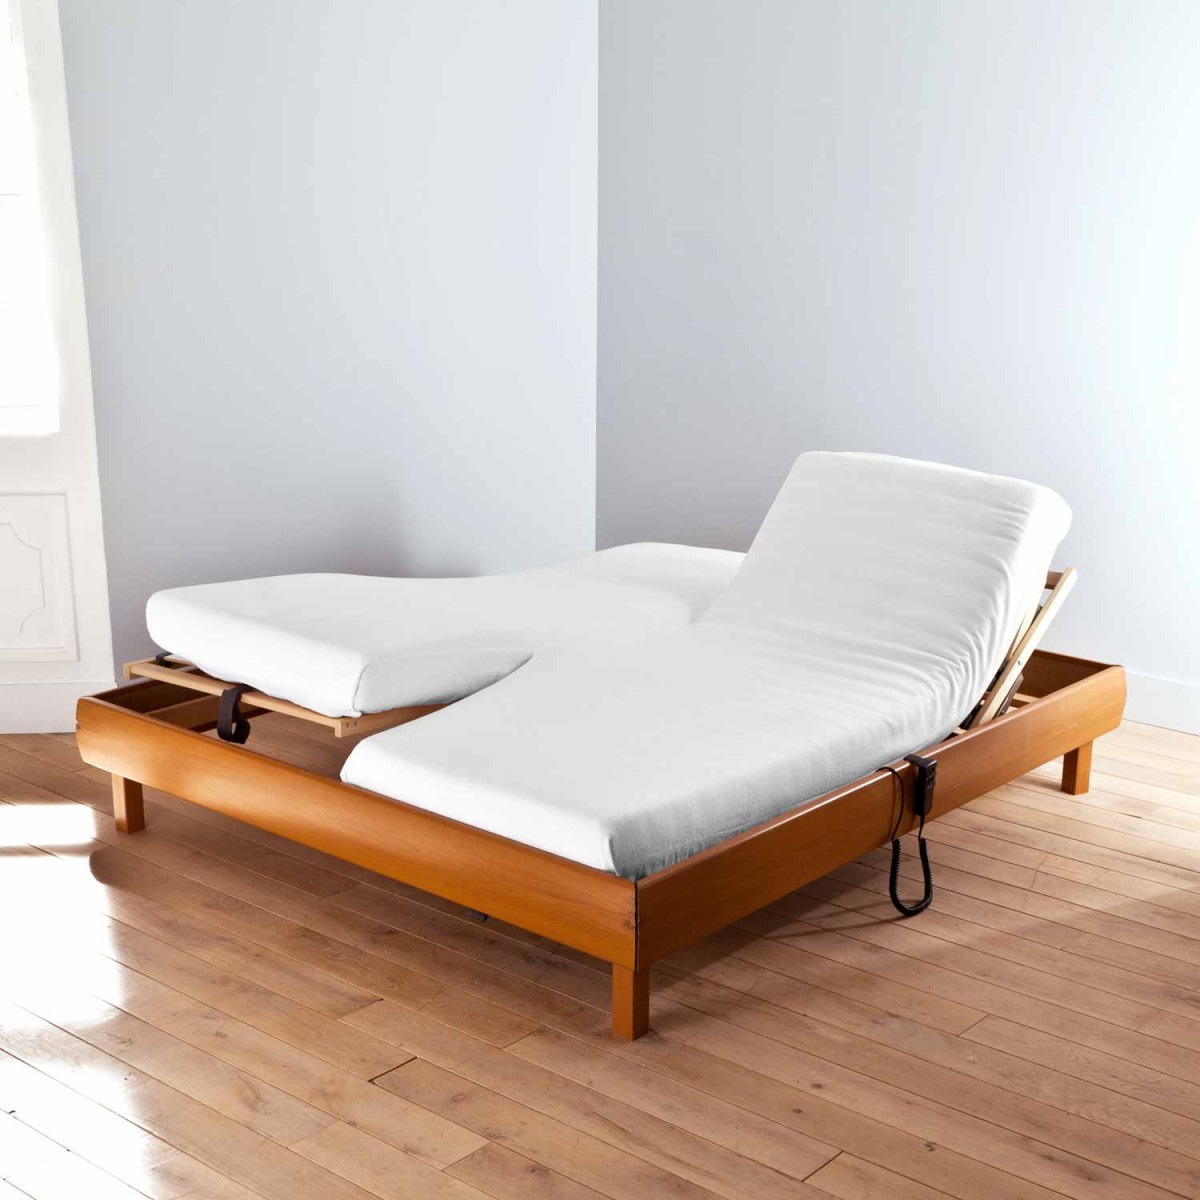 Fitted Sheet Matter Protector For Articulated Beds | Linge de lit | Tradition des Vosges